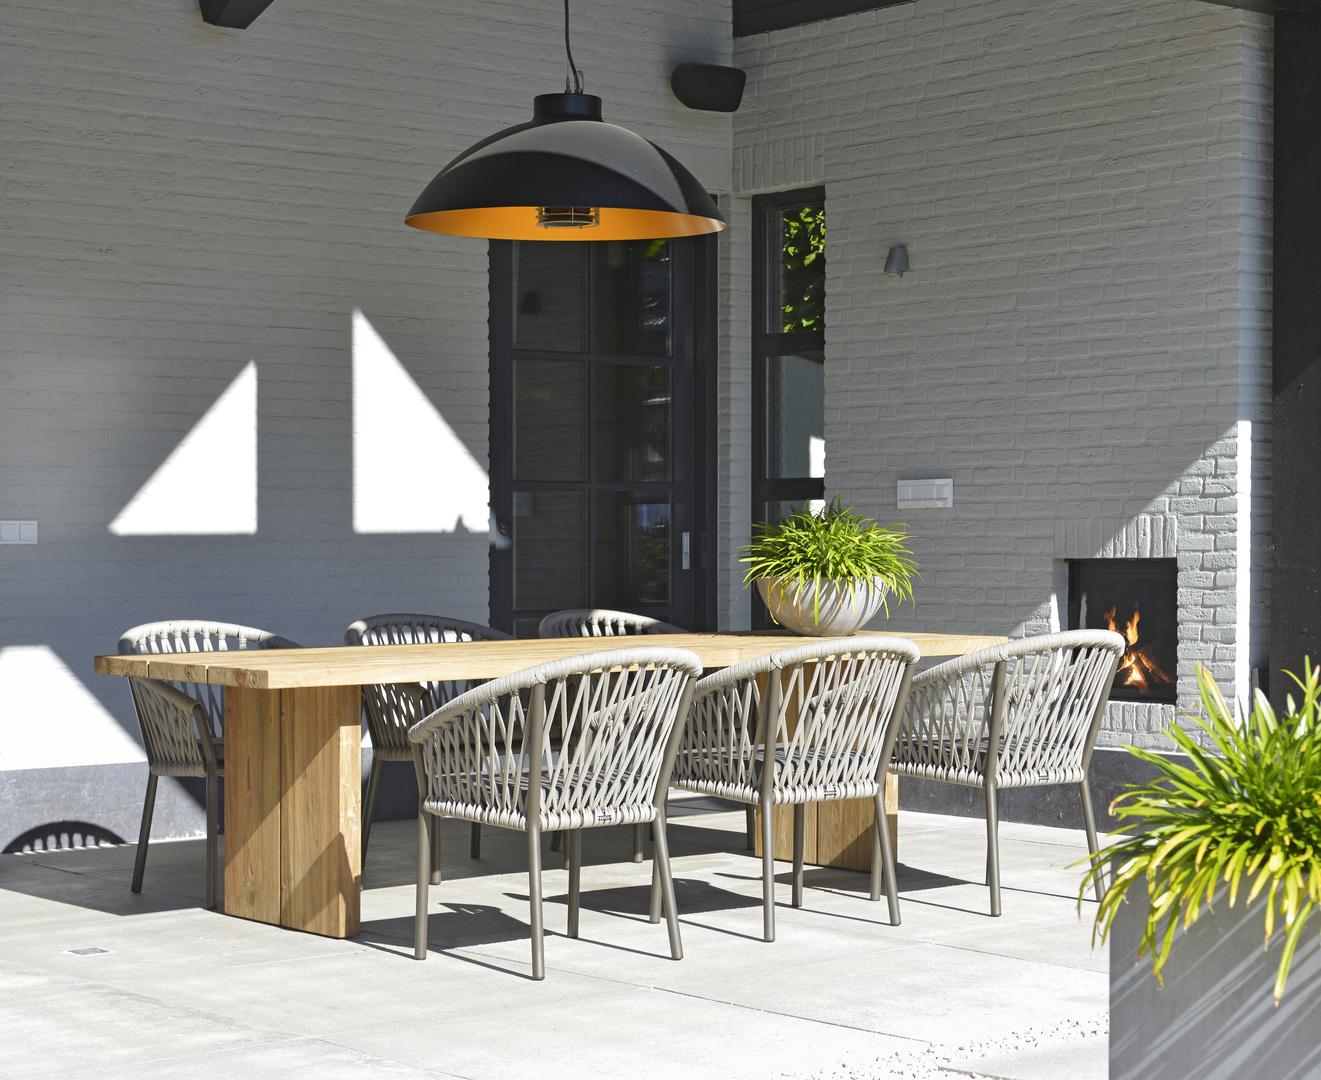 2019 Borek Ardenza belt Majinto chair Studio Borek - reclaimed teak Sevilla table Studio Borek (close-up)  (1).jpg